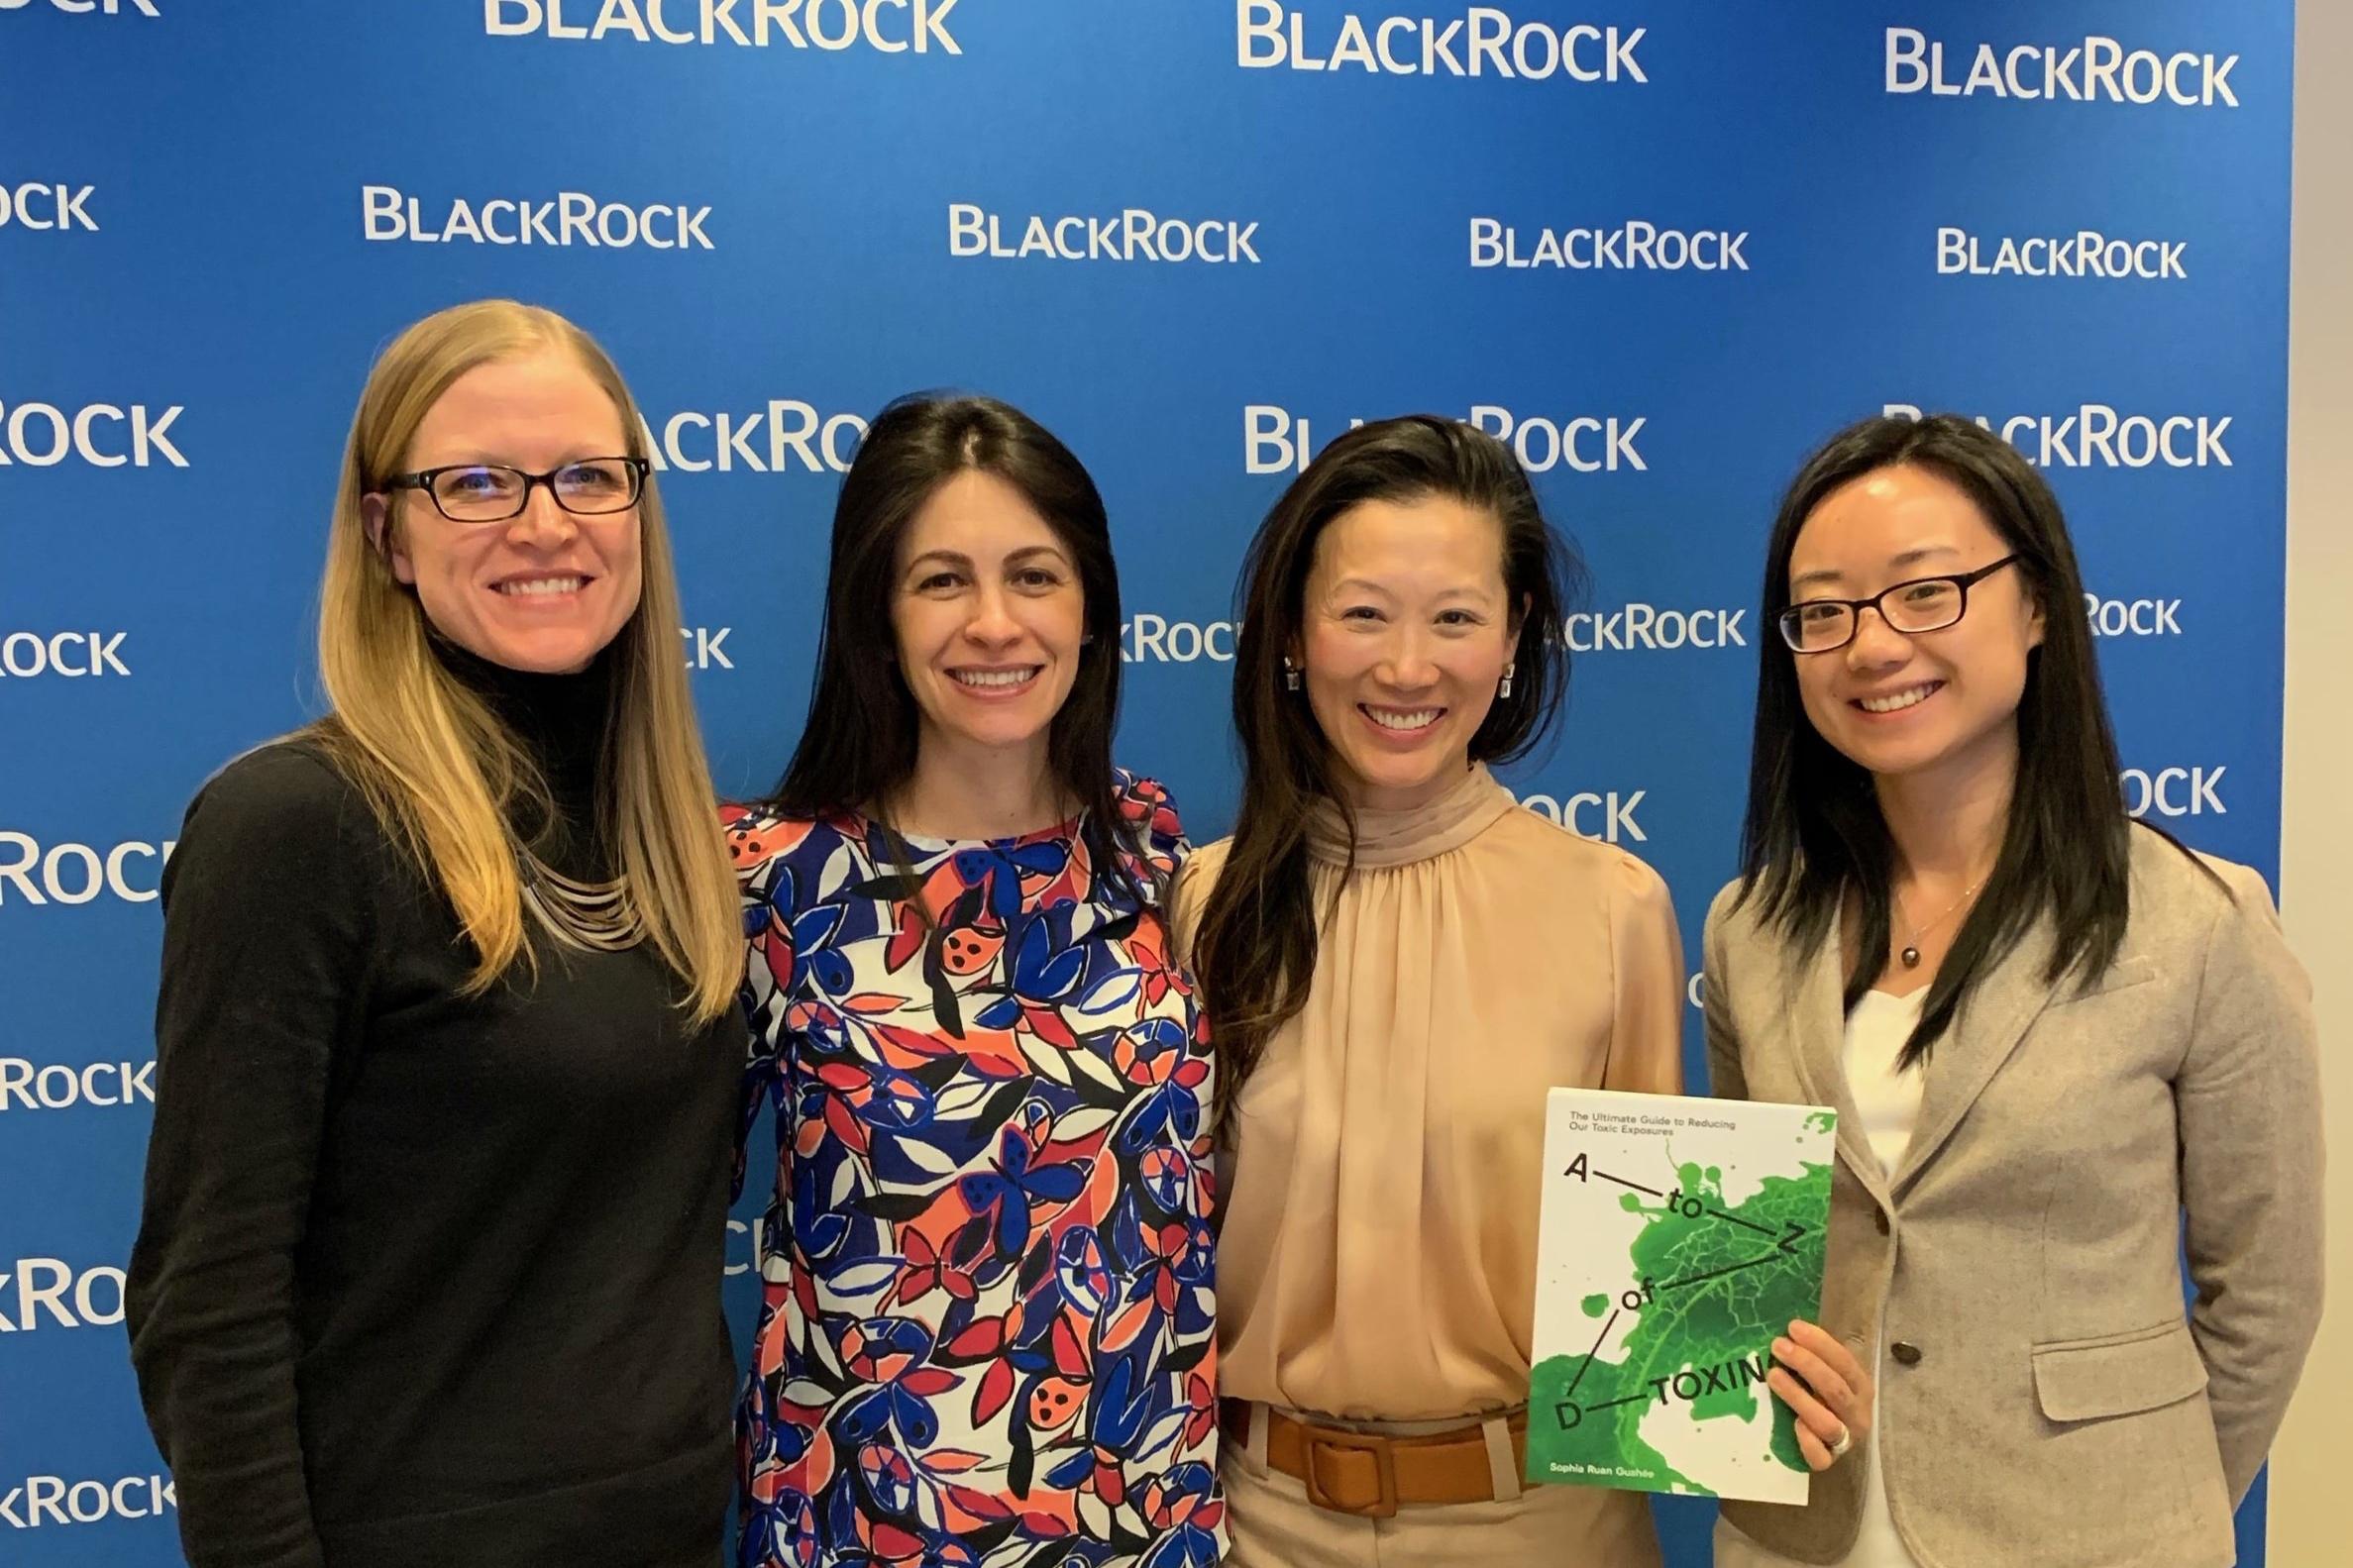 Corporate-Wellness-BlackRock-NYC-2019-min.jpg